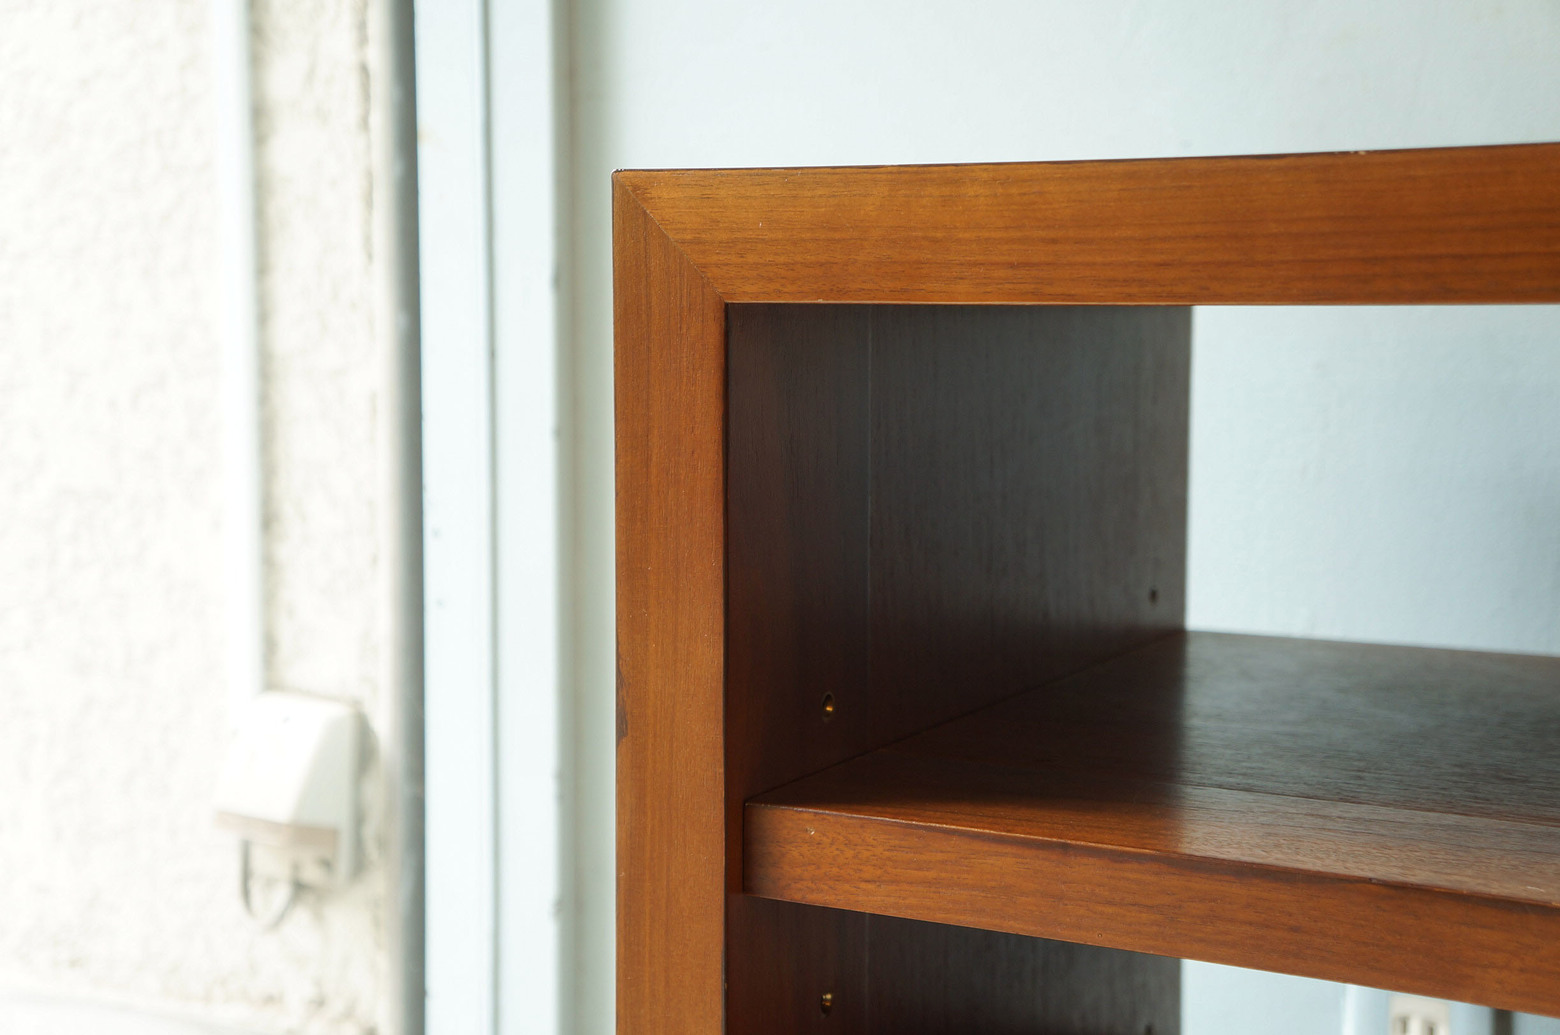 Wooden Audio Rack Simple Modern Design/オーディオラック 木製 シンプル モダン キャビネット 収納家具 2